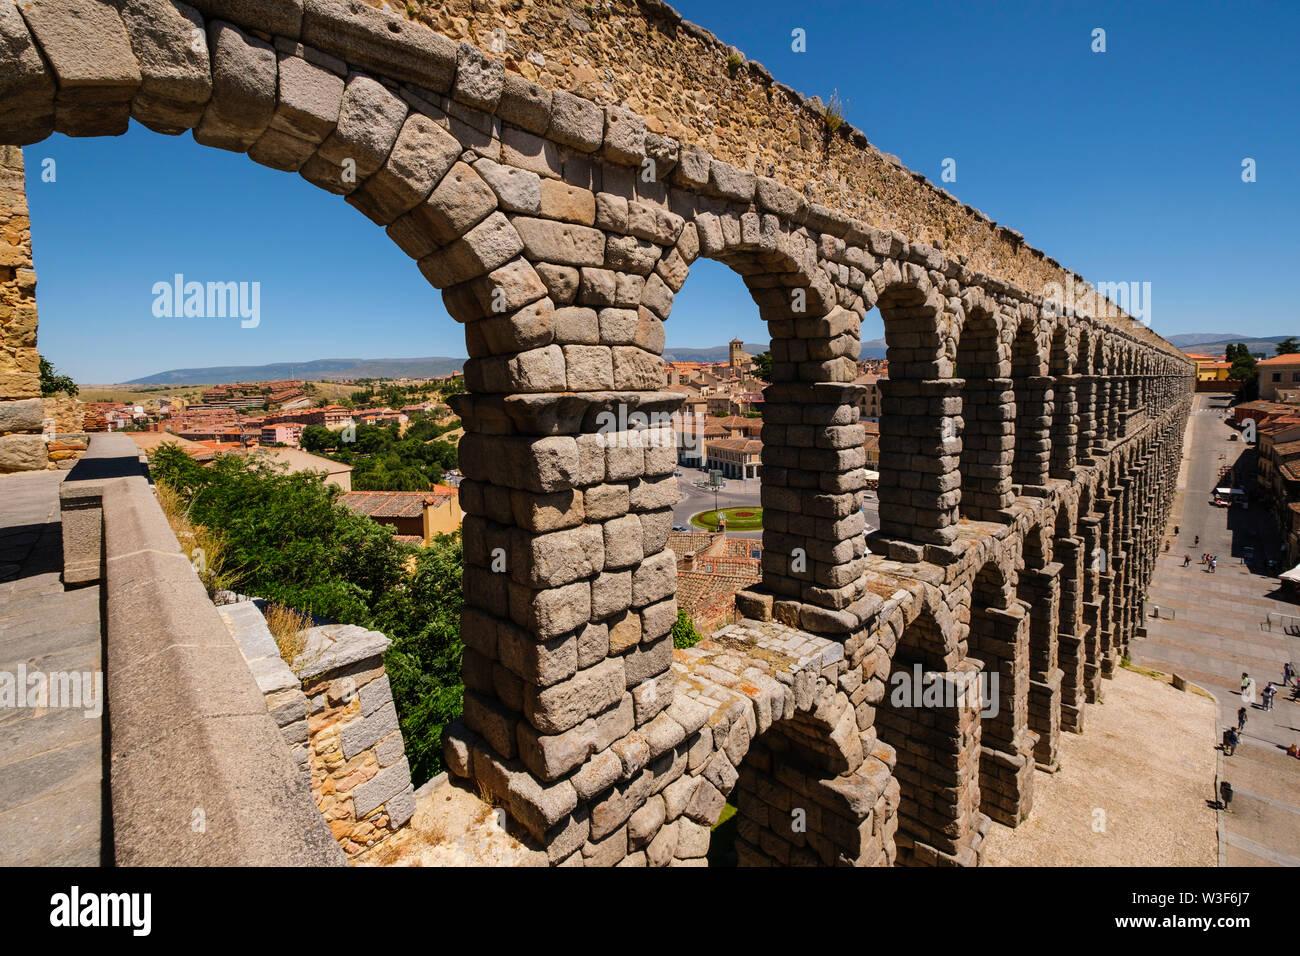 Ancient roman aqueduct, UNESCO World Heritage Site. Segovia city. Castilla León, Spain Europe Stock Photo